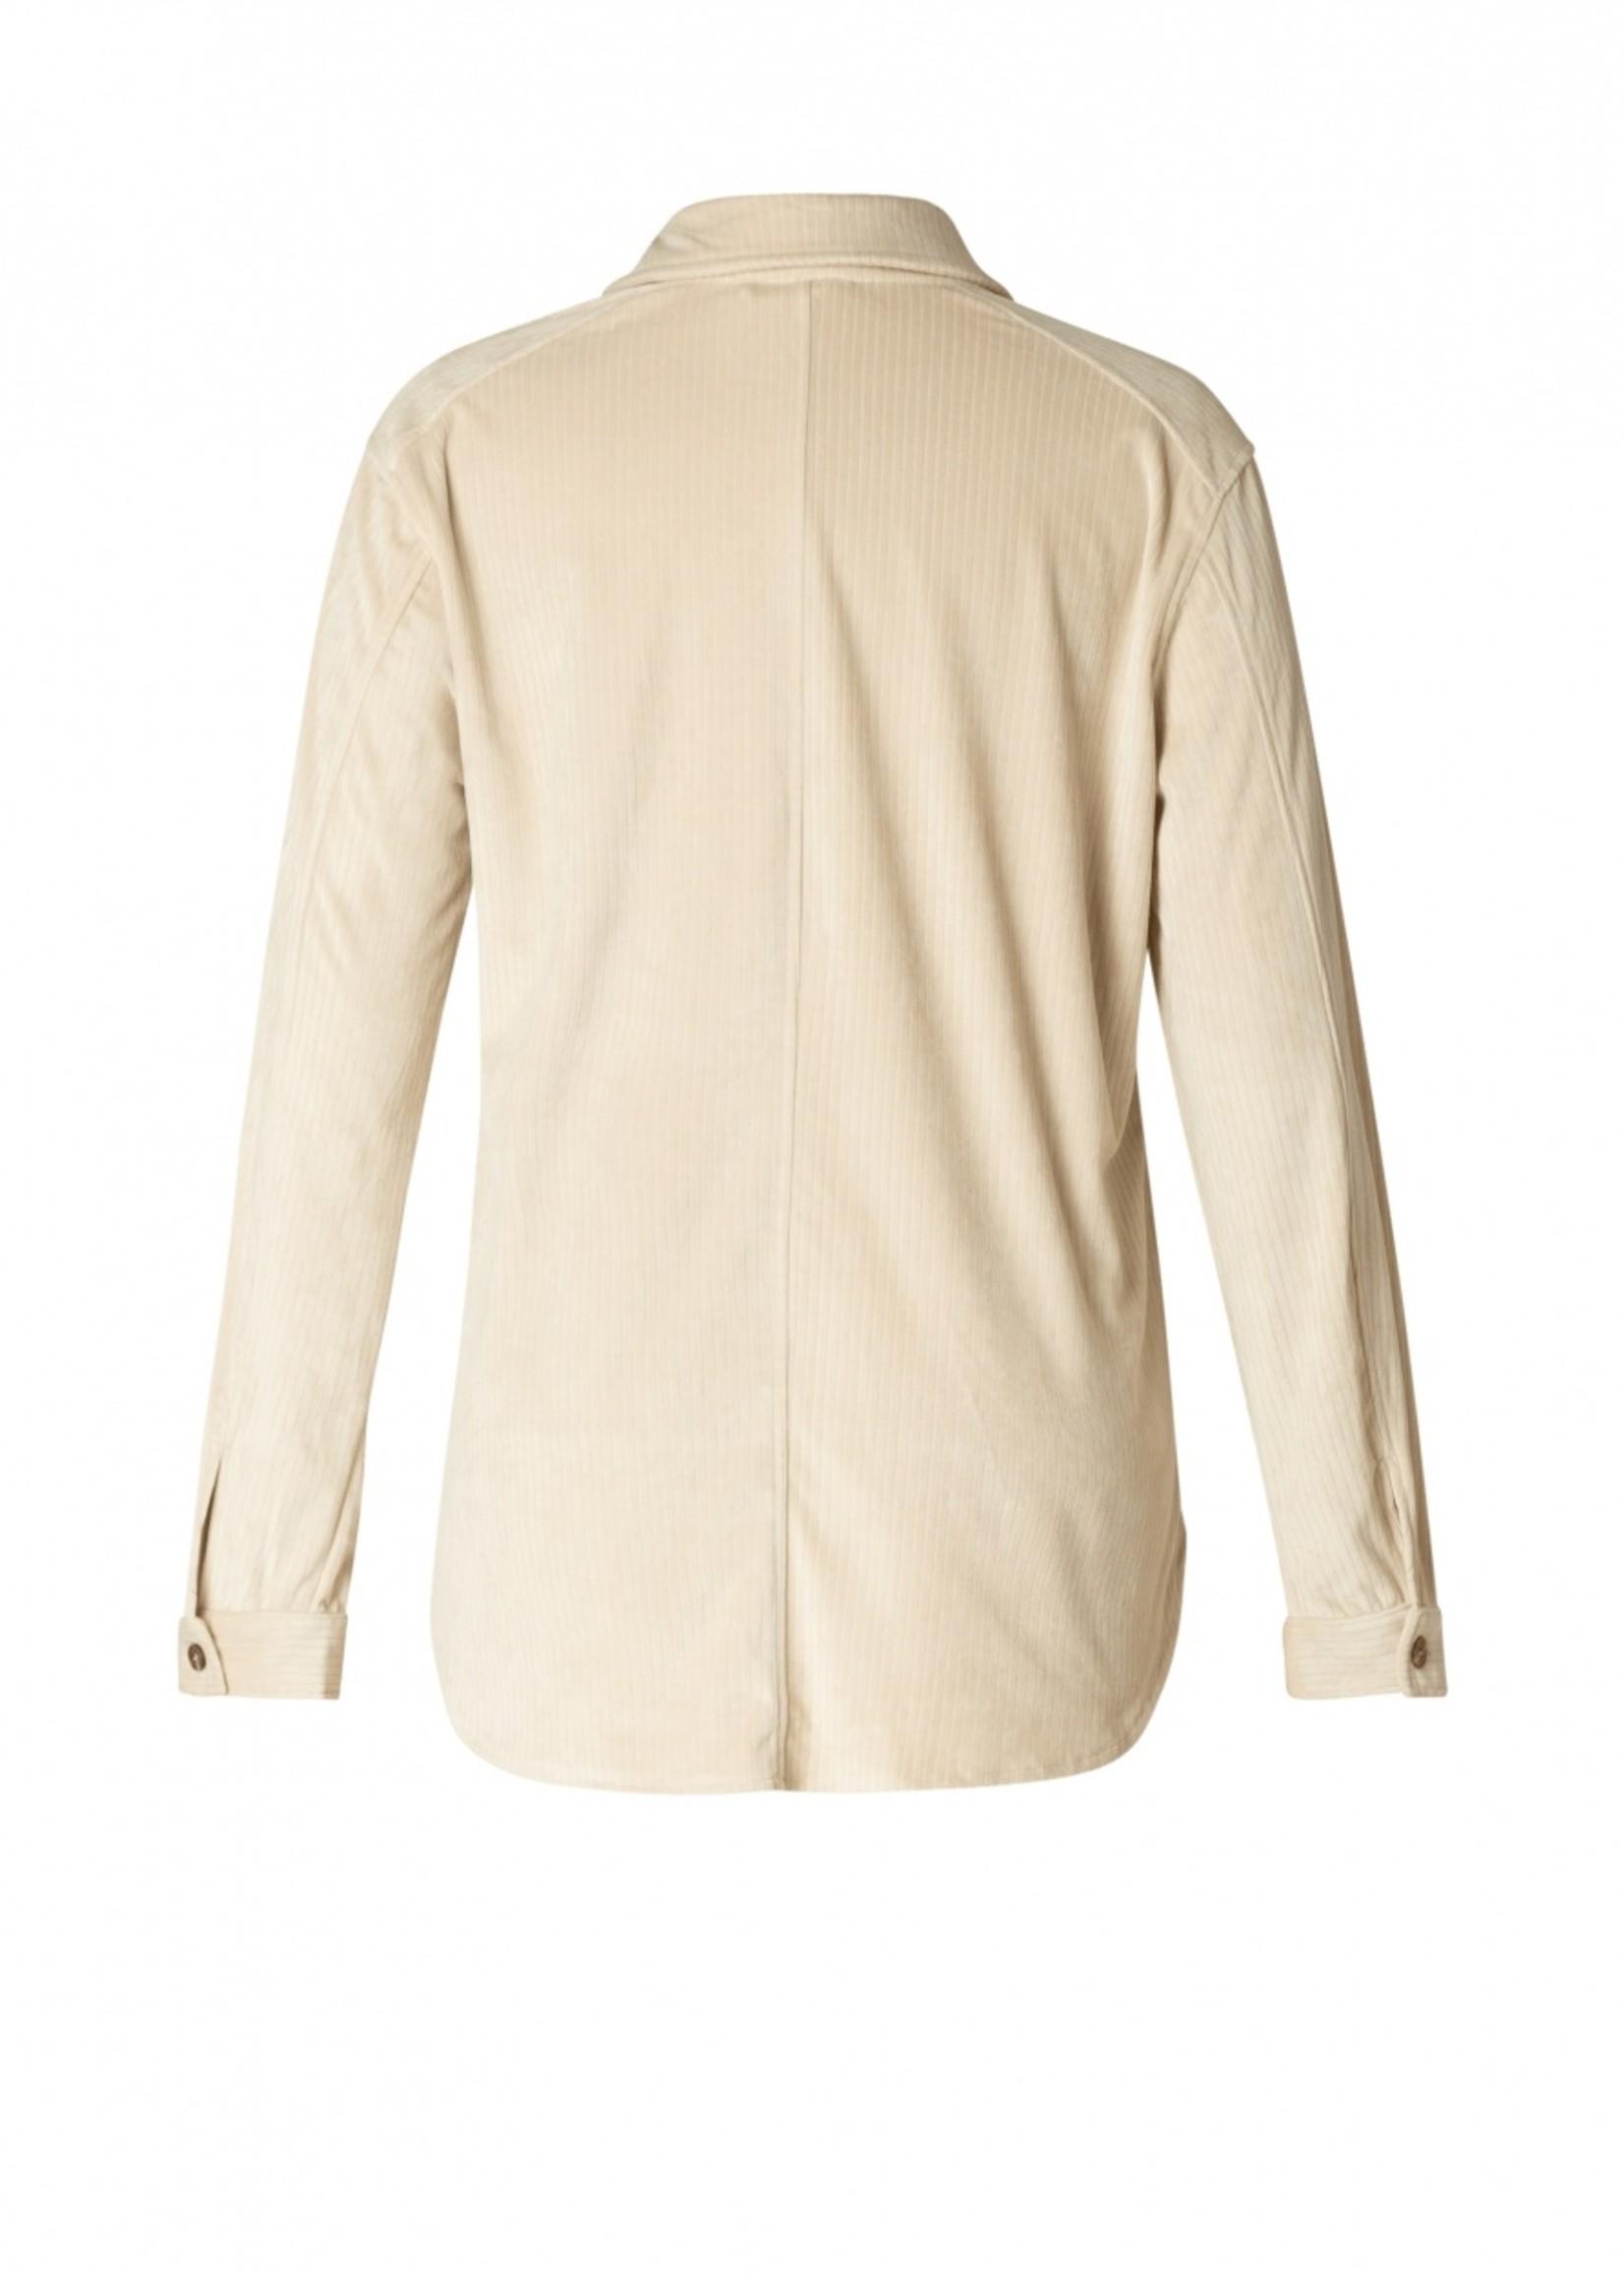 Ivy Beau Ivy Beau Quishara Jacket